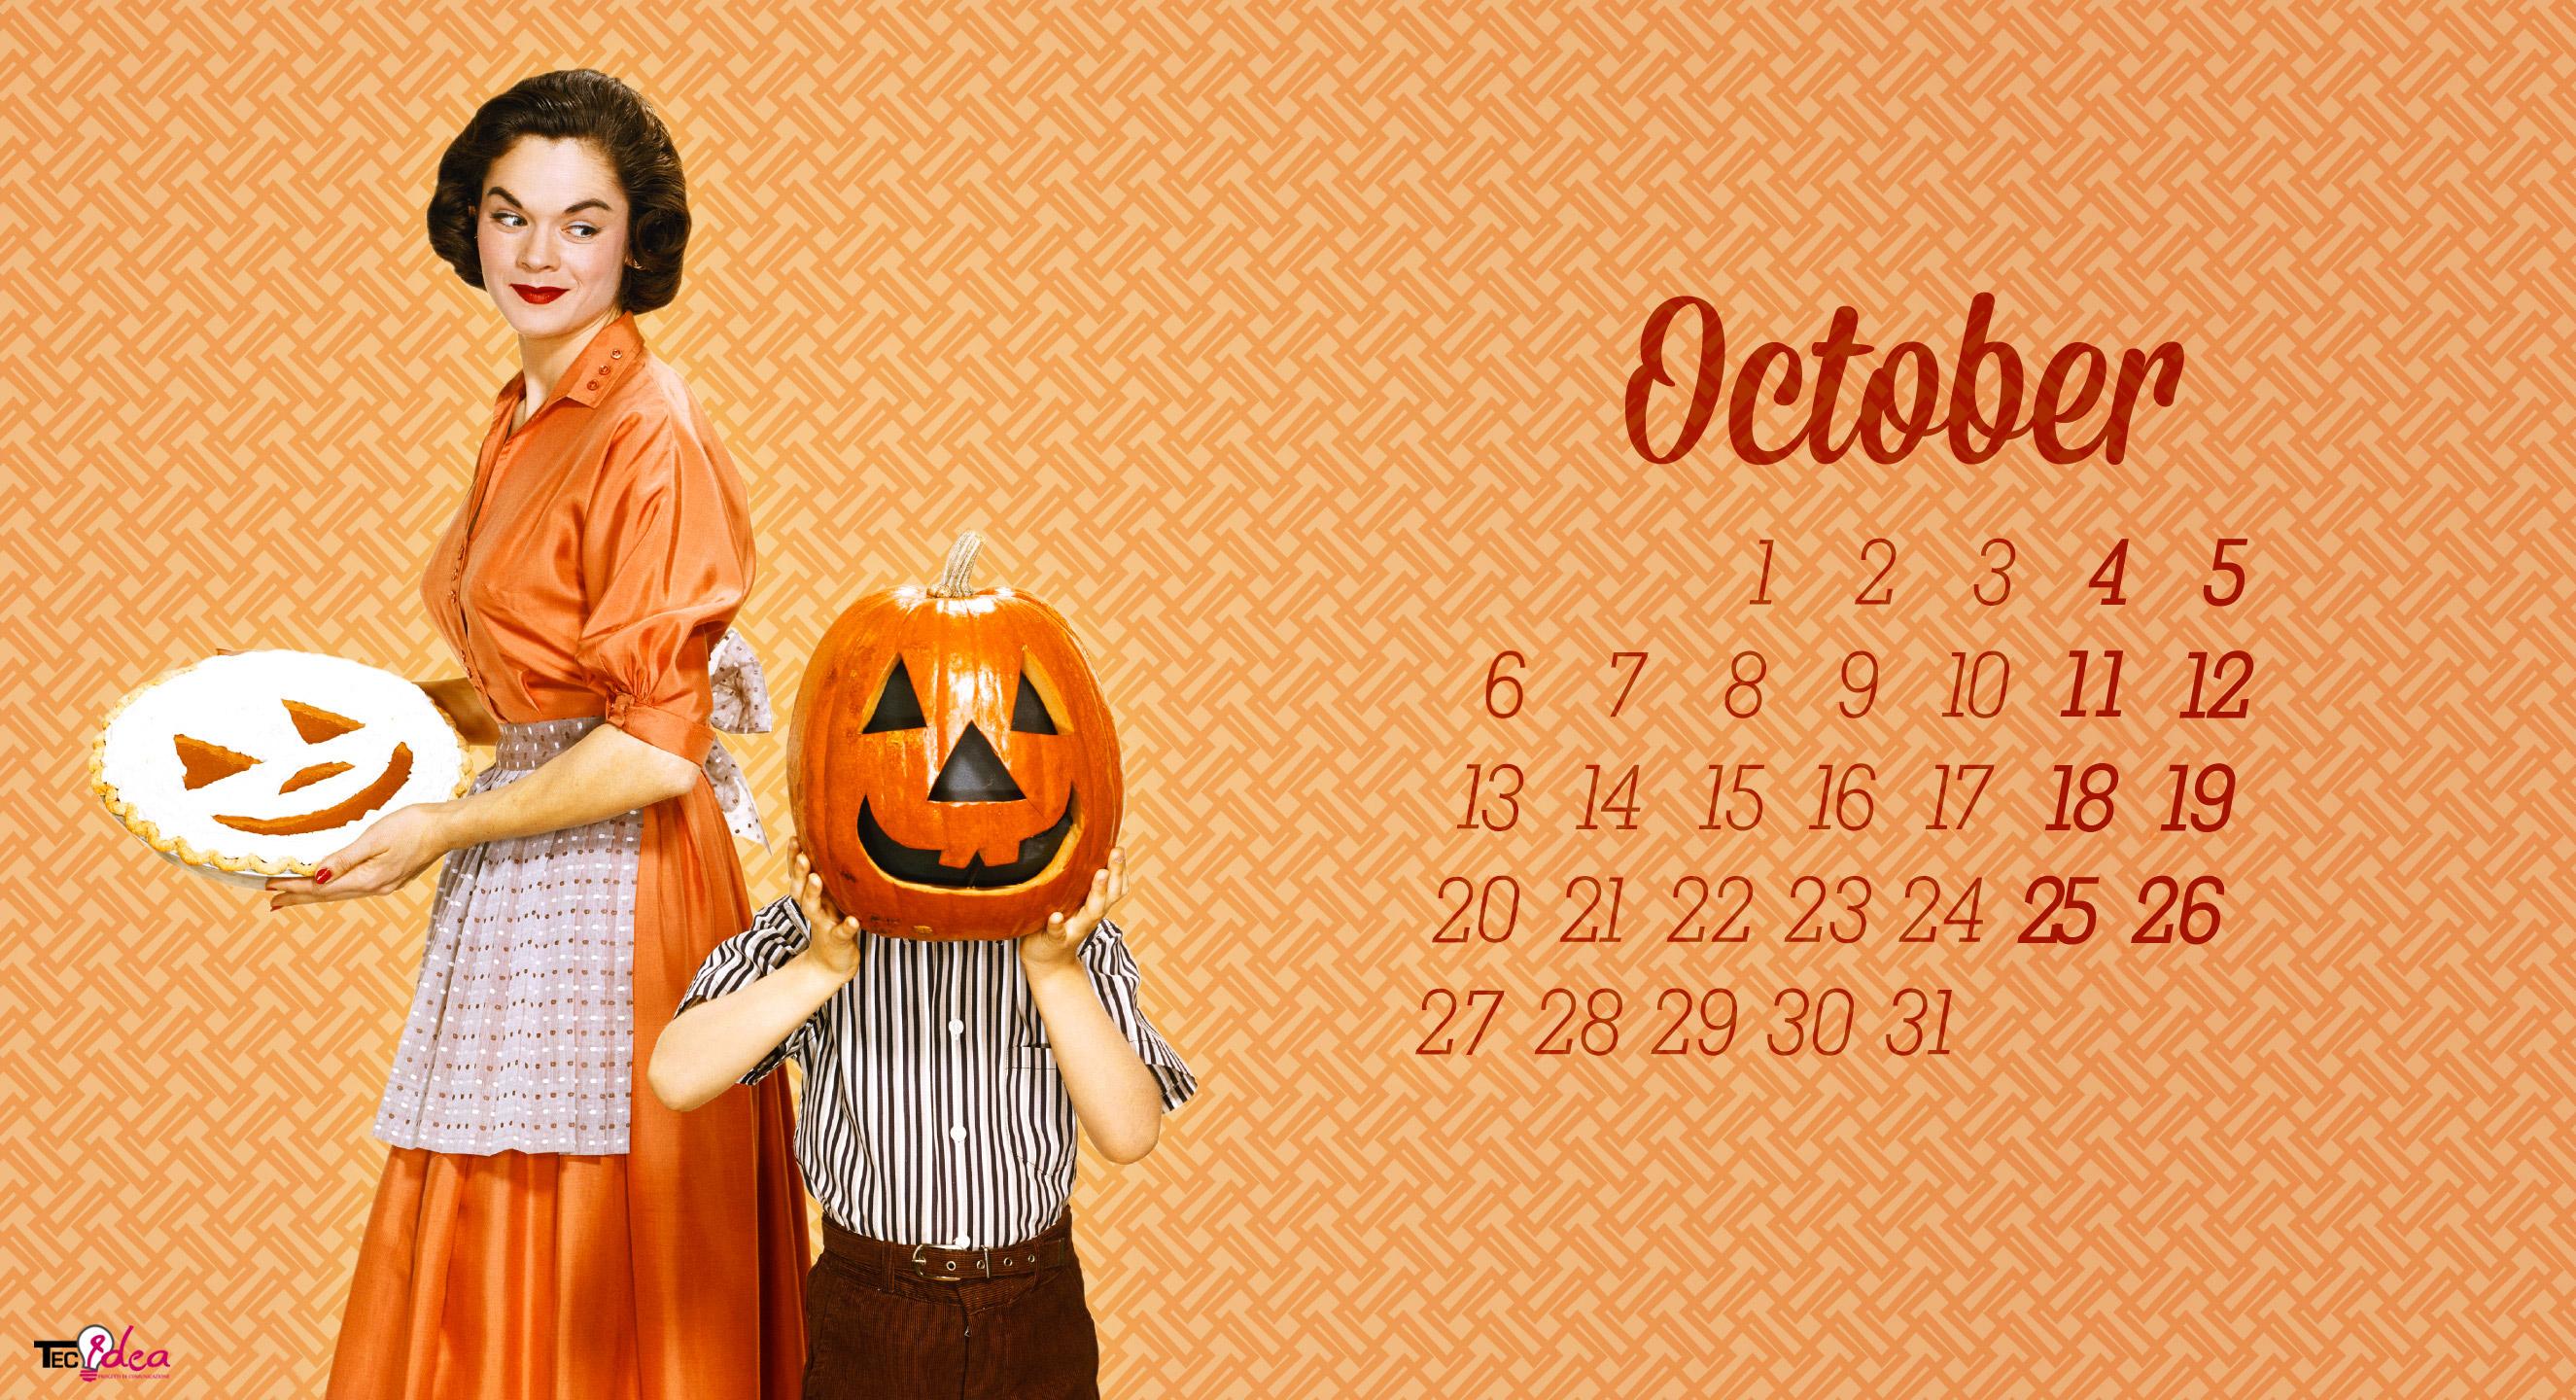 Ottobre 2014 - Halloween retrò